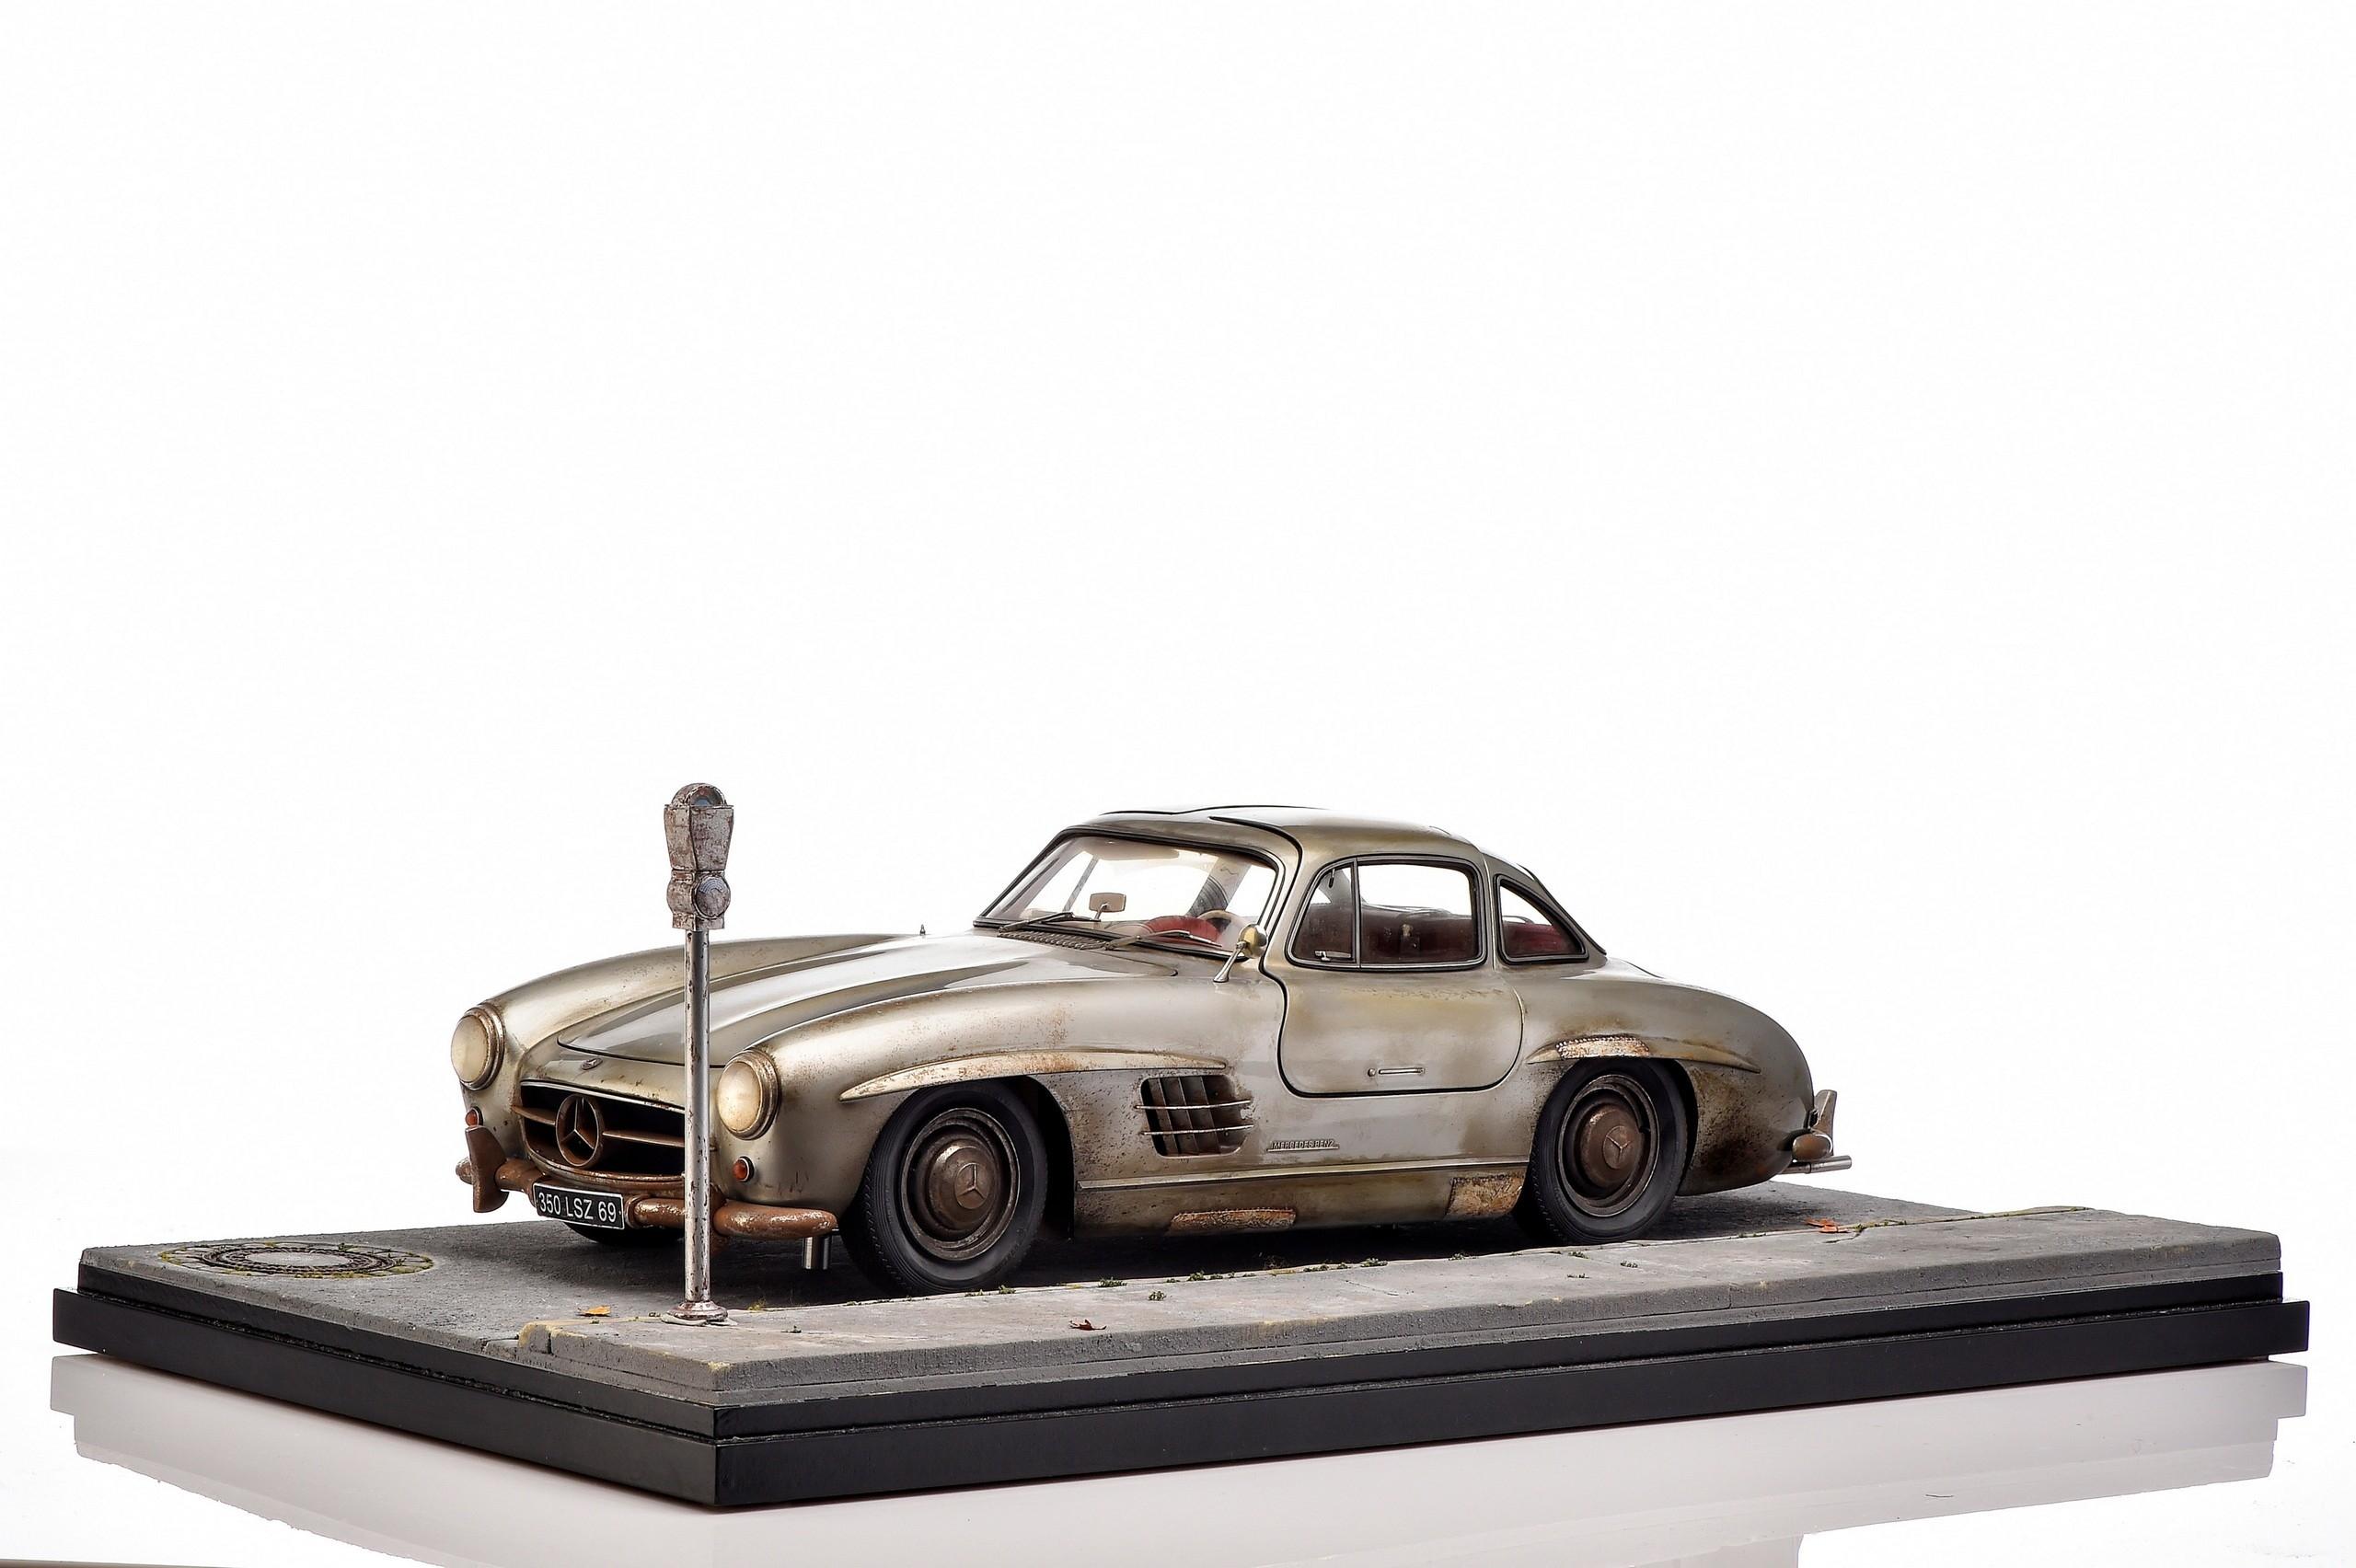 Mercedes-Benz SL modellini